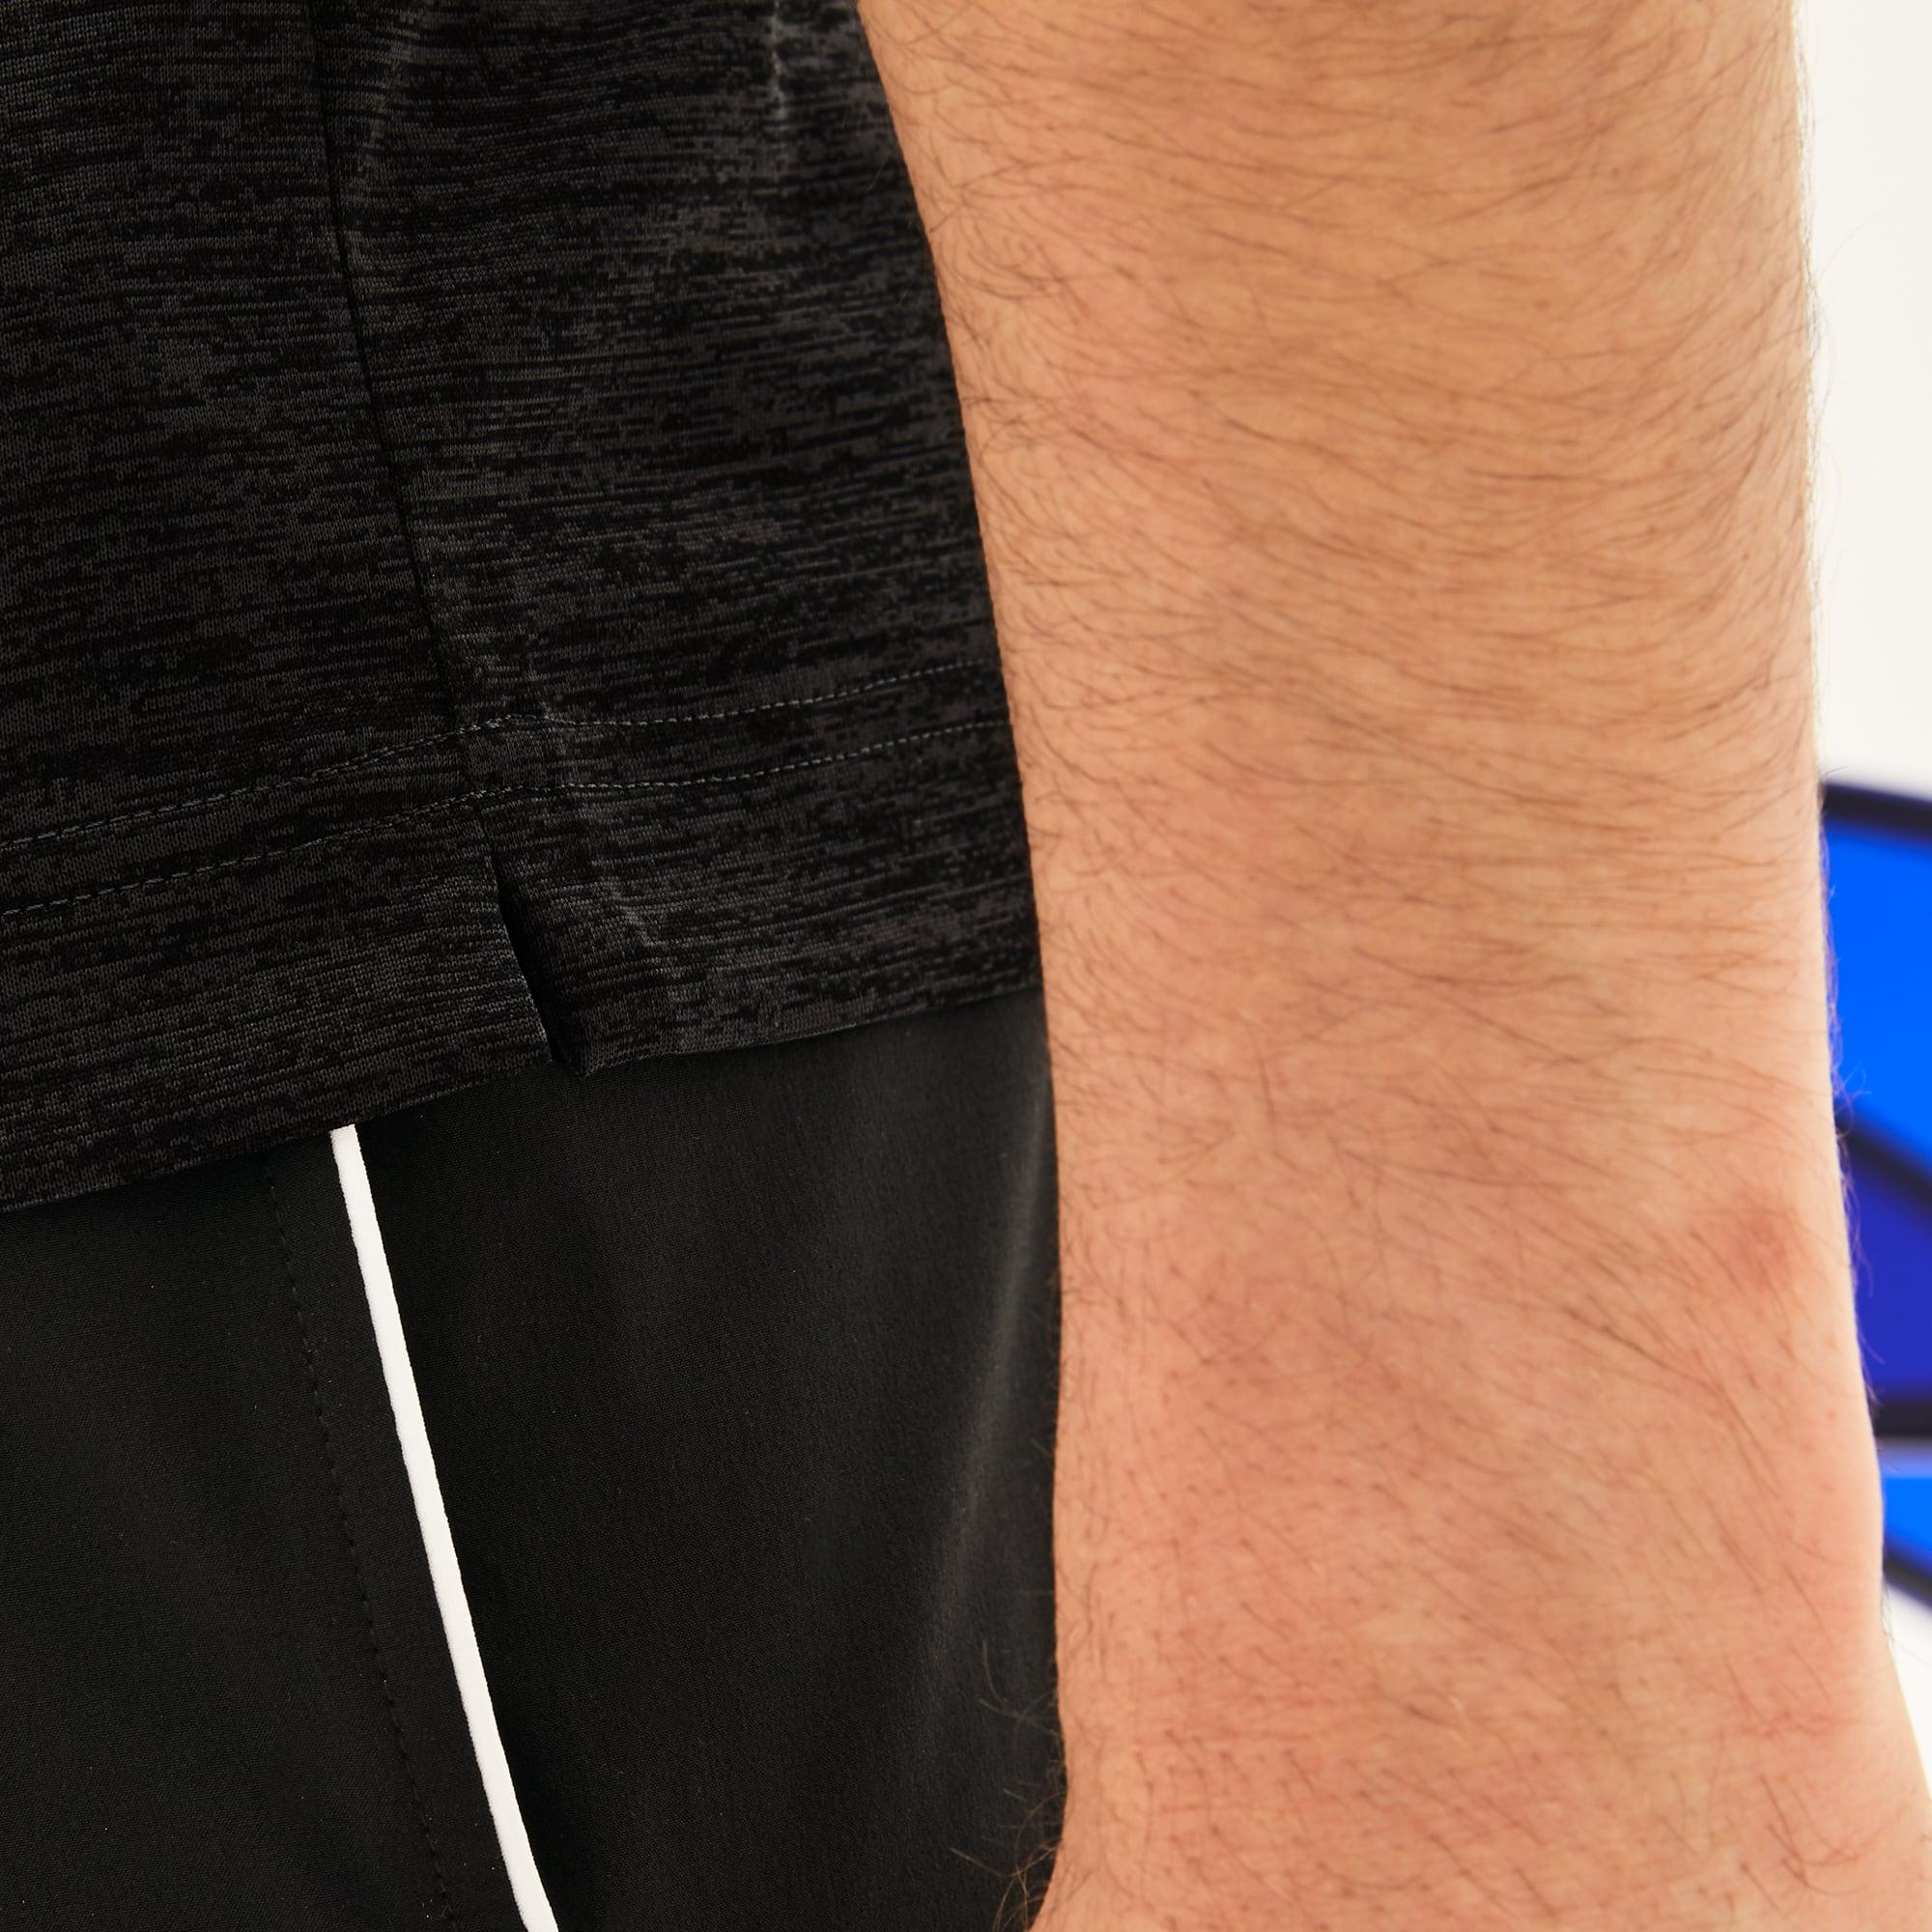 Lacoste - Herren-Poloshirt aus meliertem Jersey LACOSTE SPORT - 6